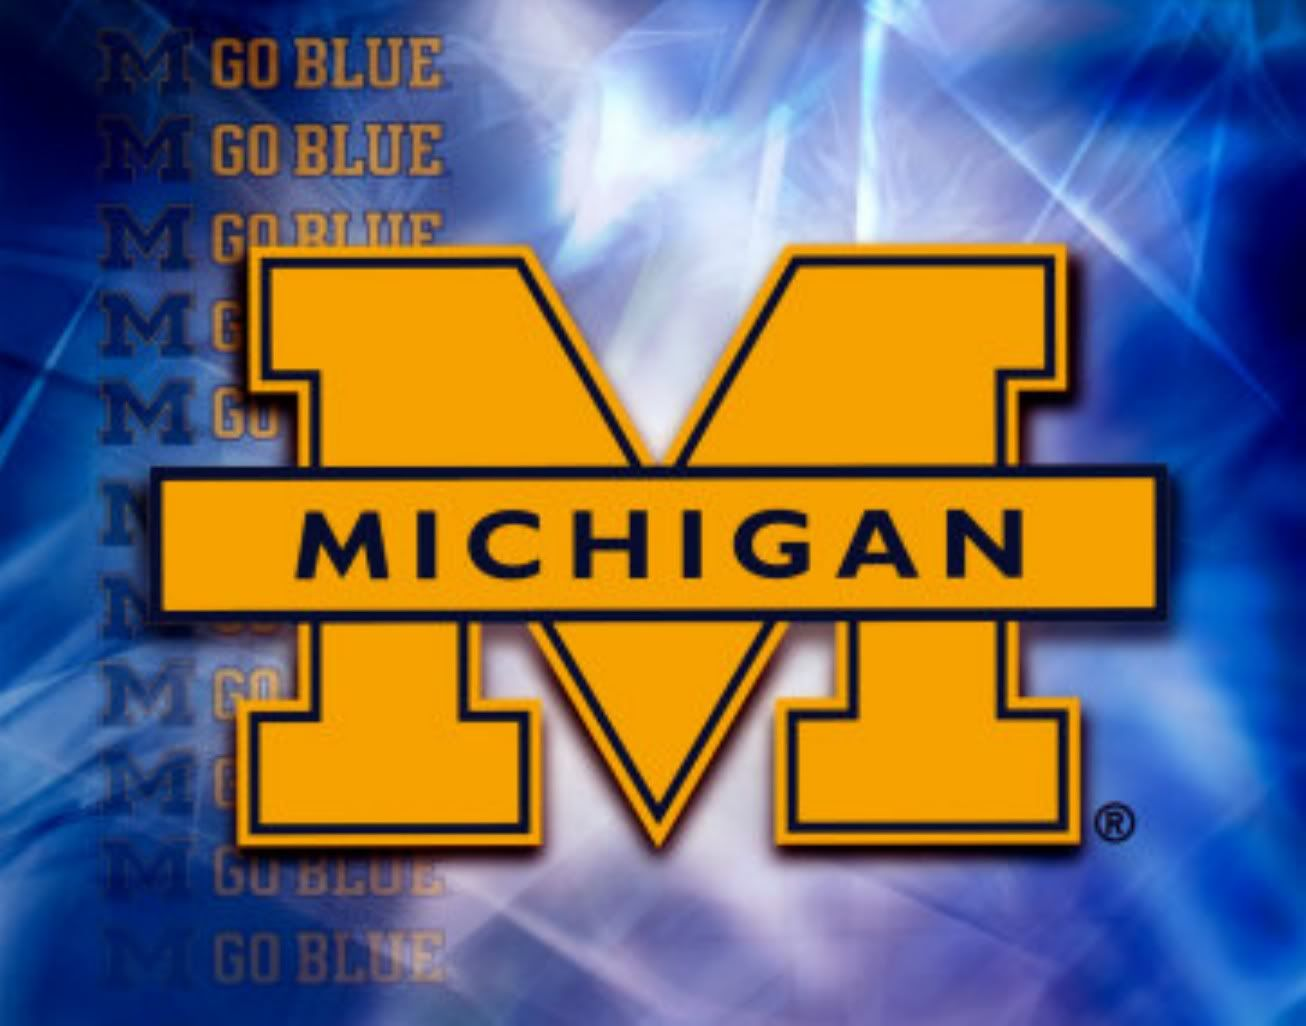 Michigan Football Michigan football, Go blue, Michigan